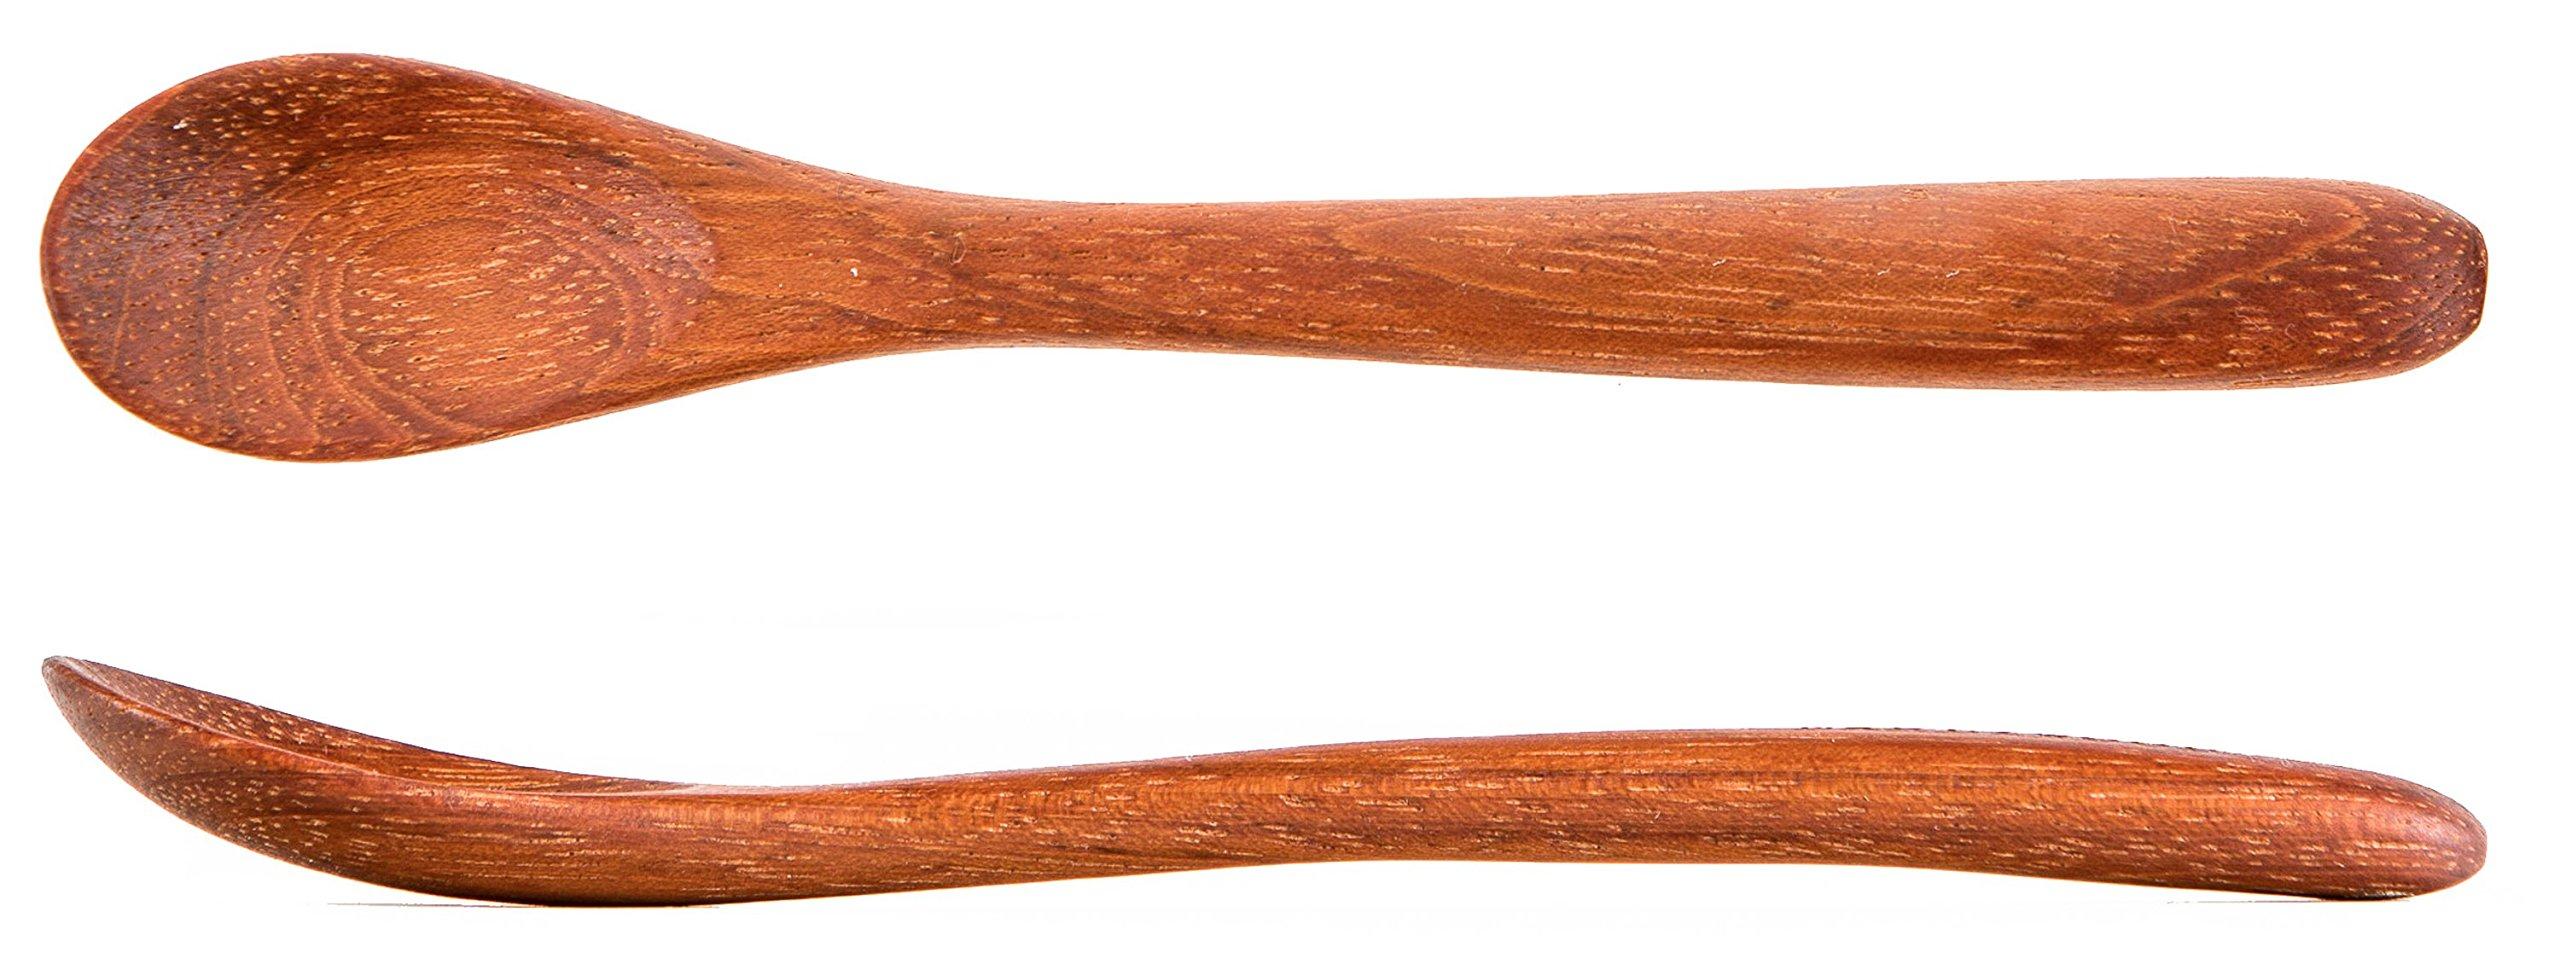 Wood Toddler Spoon, 7 in Handmade Wooden Baby Spoon, Hardwood and Heirloom Quality, A Keepsake Wood Feeding Spoon - Jatoba